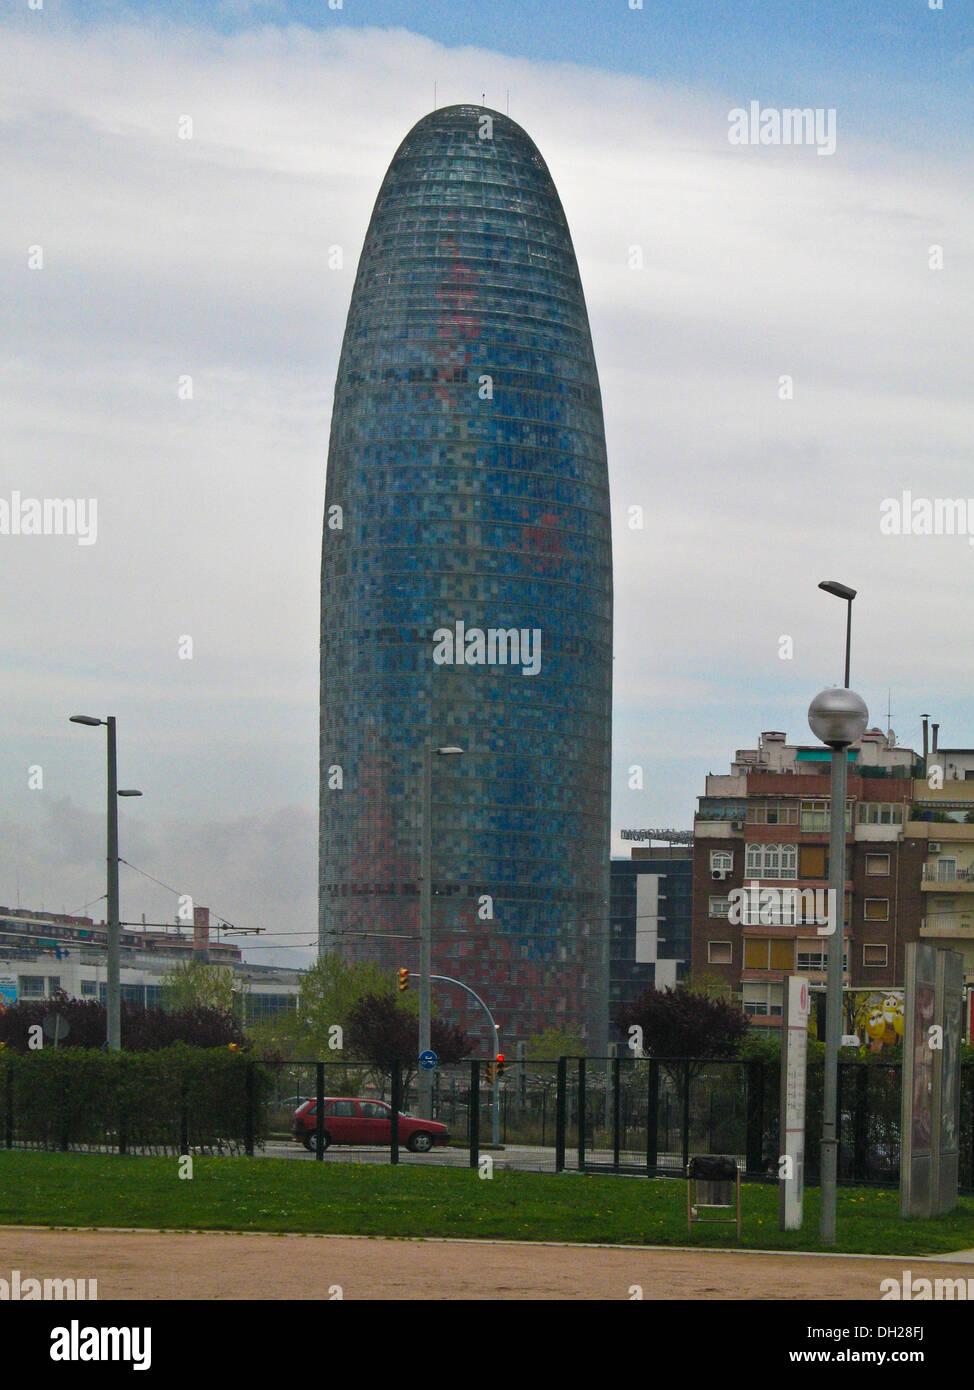 38-story skyscraper / tower ,The Torre Agbar, located  between Avinguda Diagonal and Carrer Badajoz, Barcelona, Catalonia, Spain - Stock Image